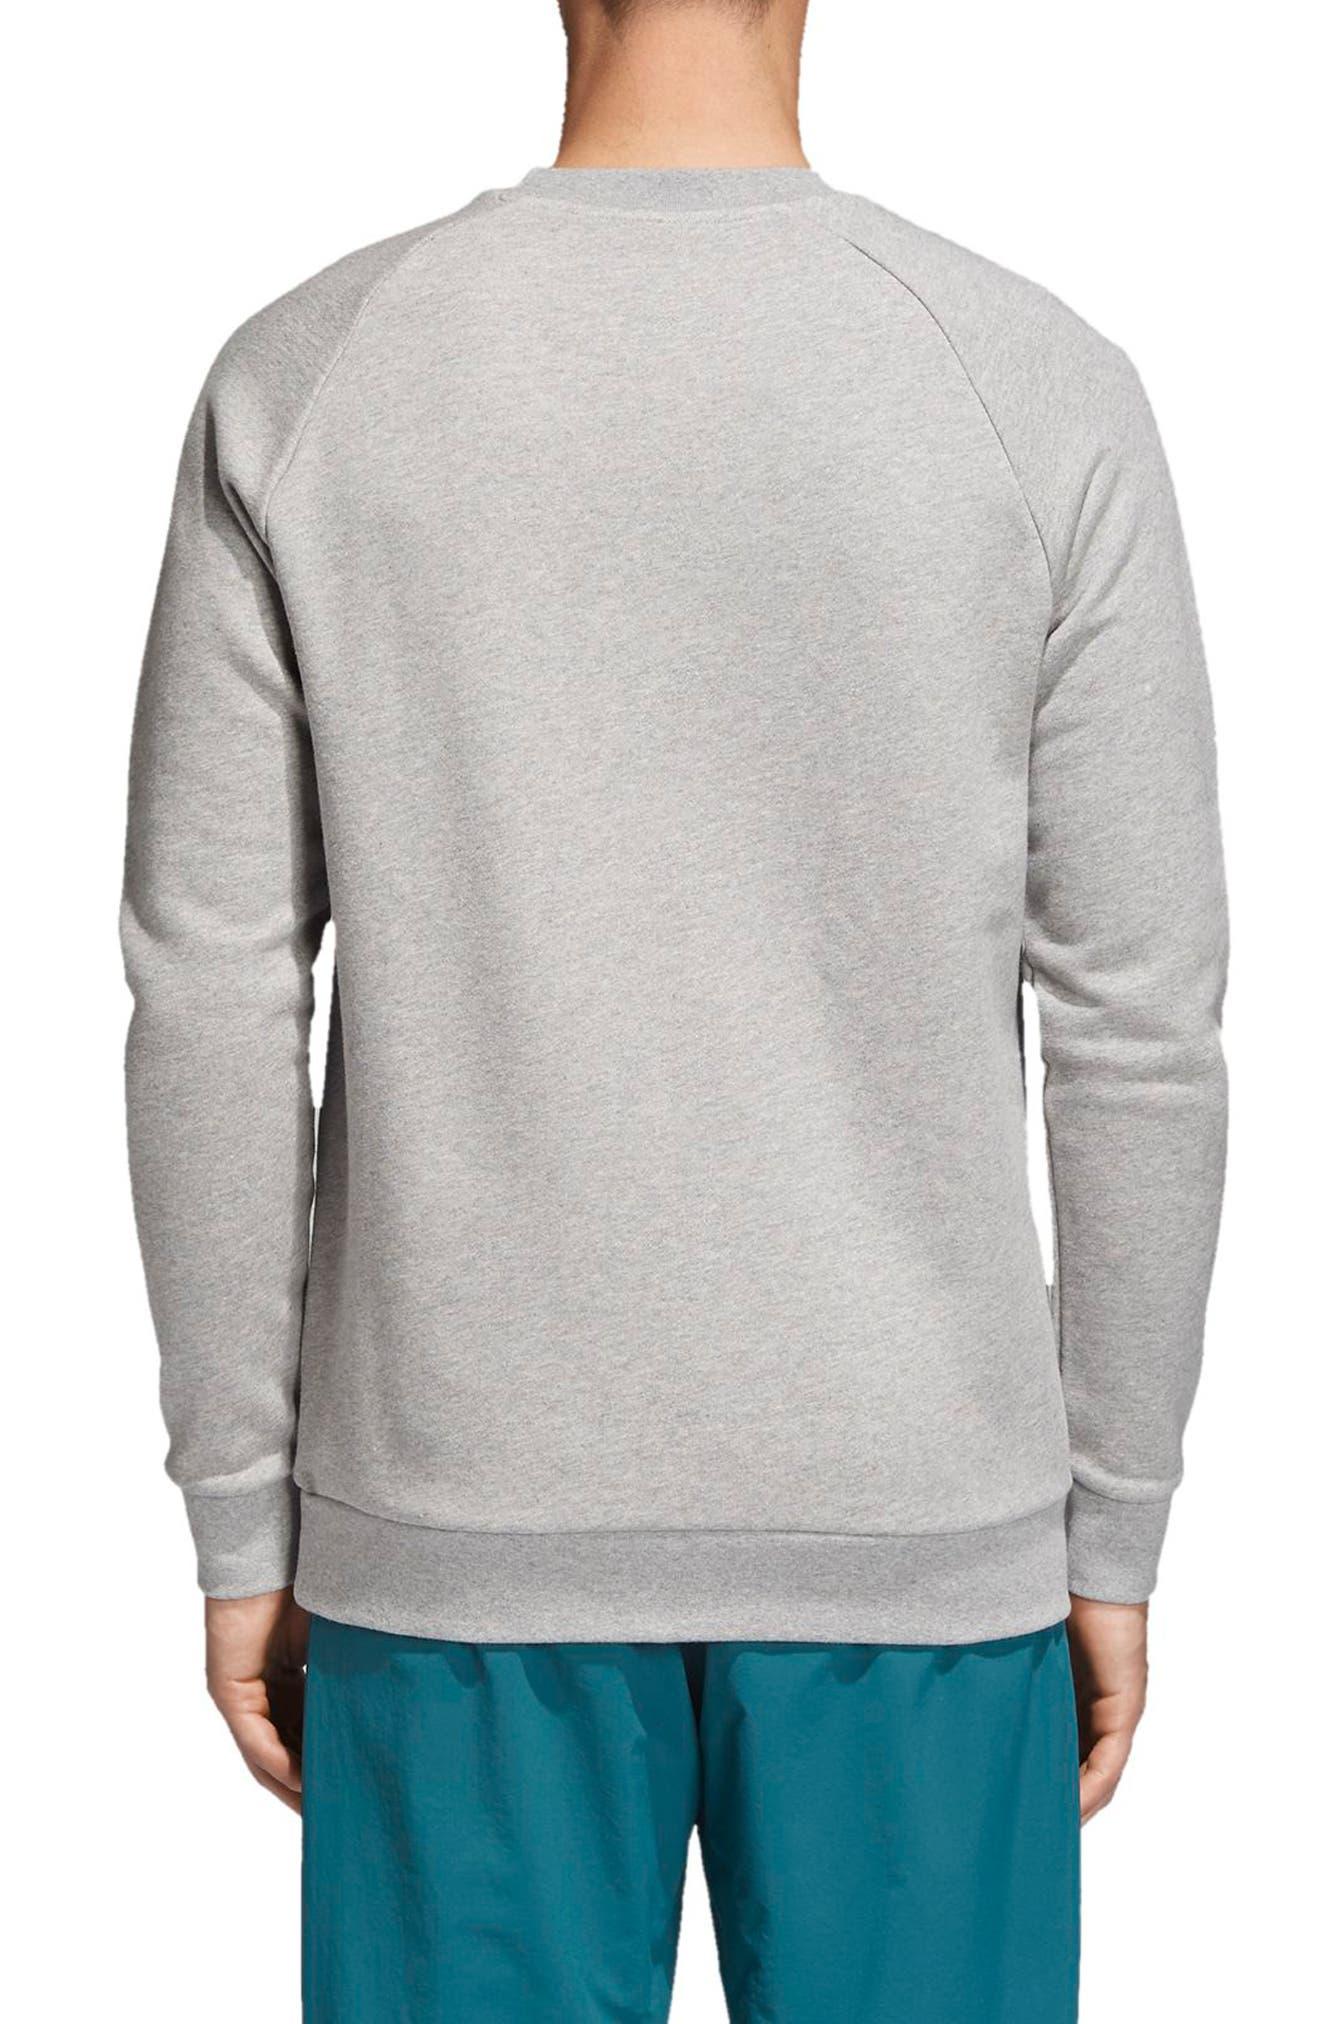 adidas Trefoil Crewneck Sweatshirt,                             Alternate thumbnail 3, color,